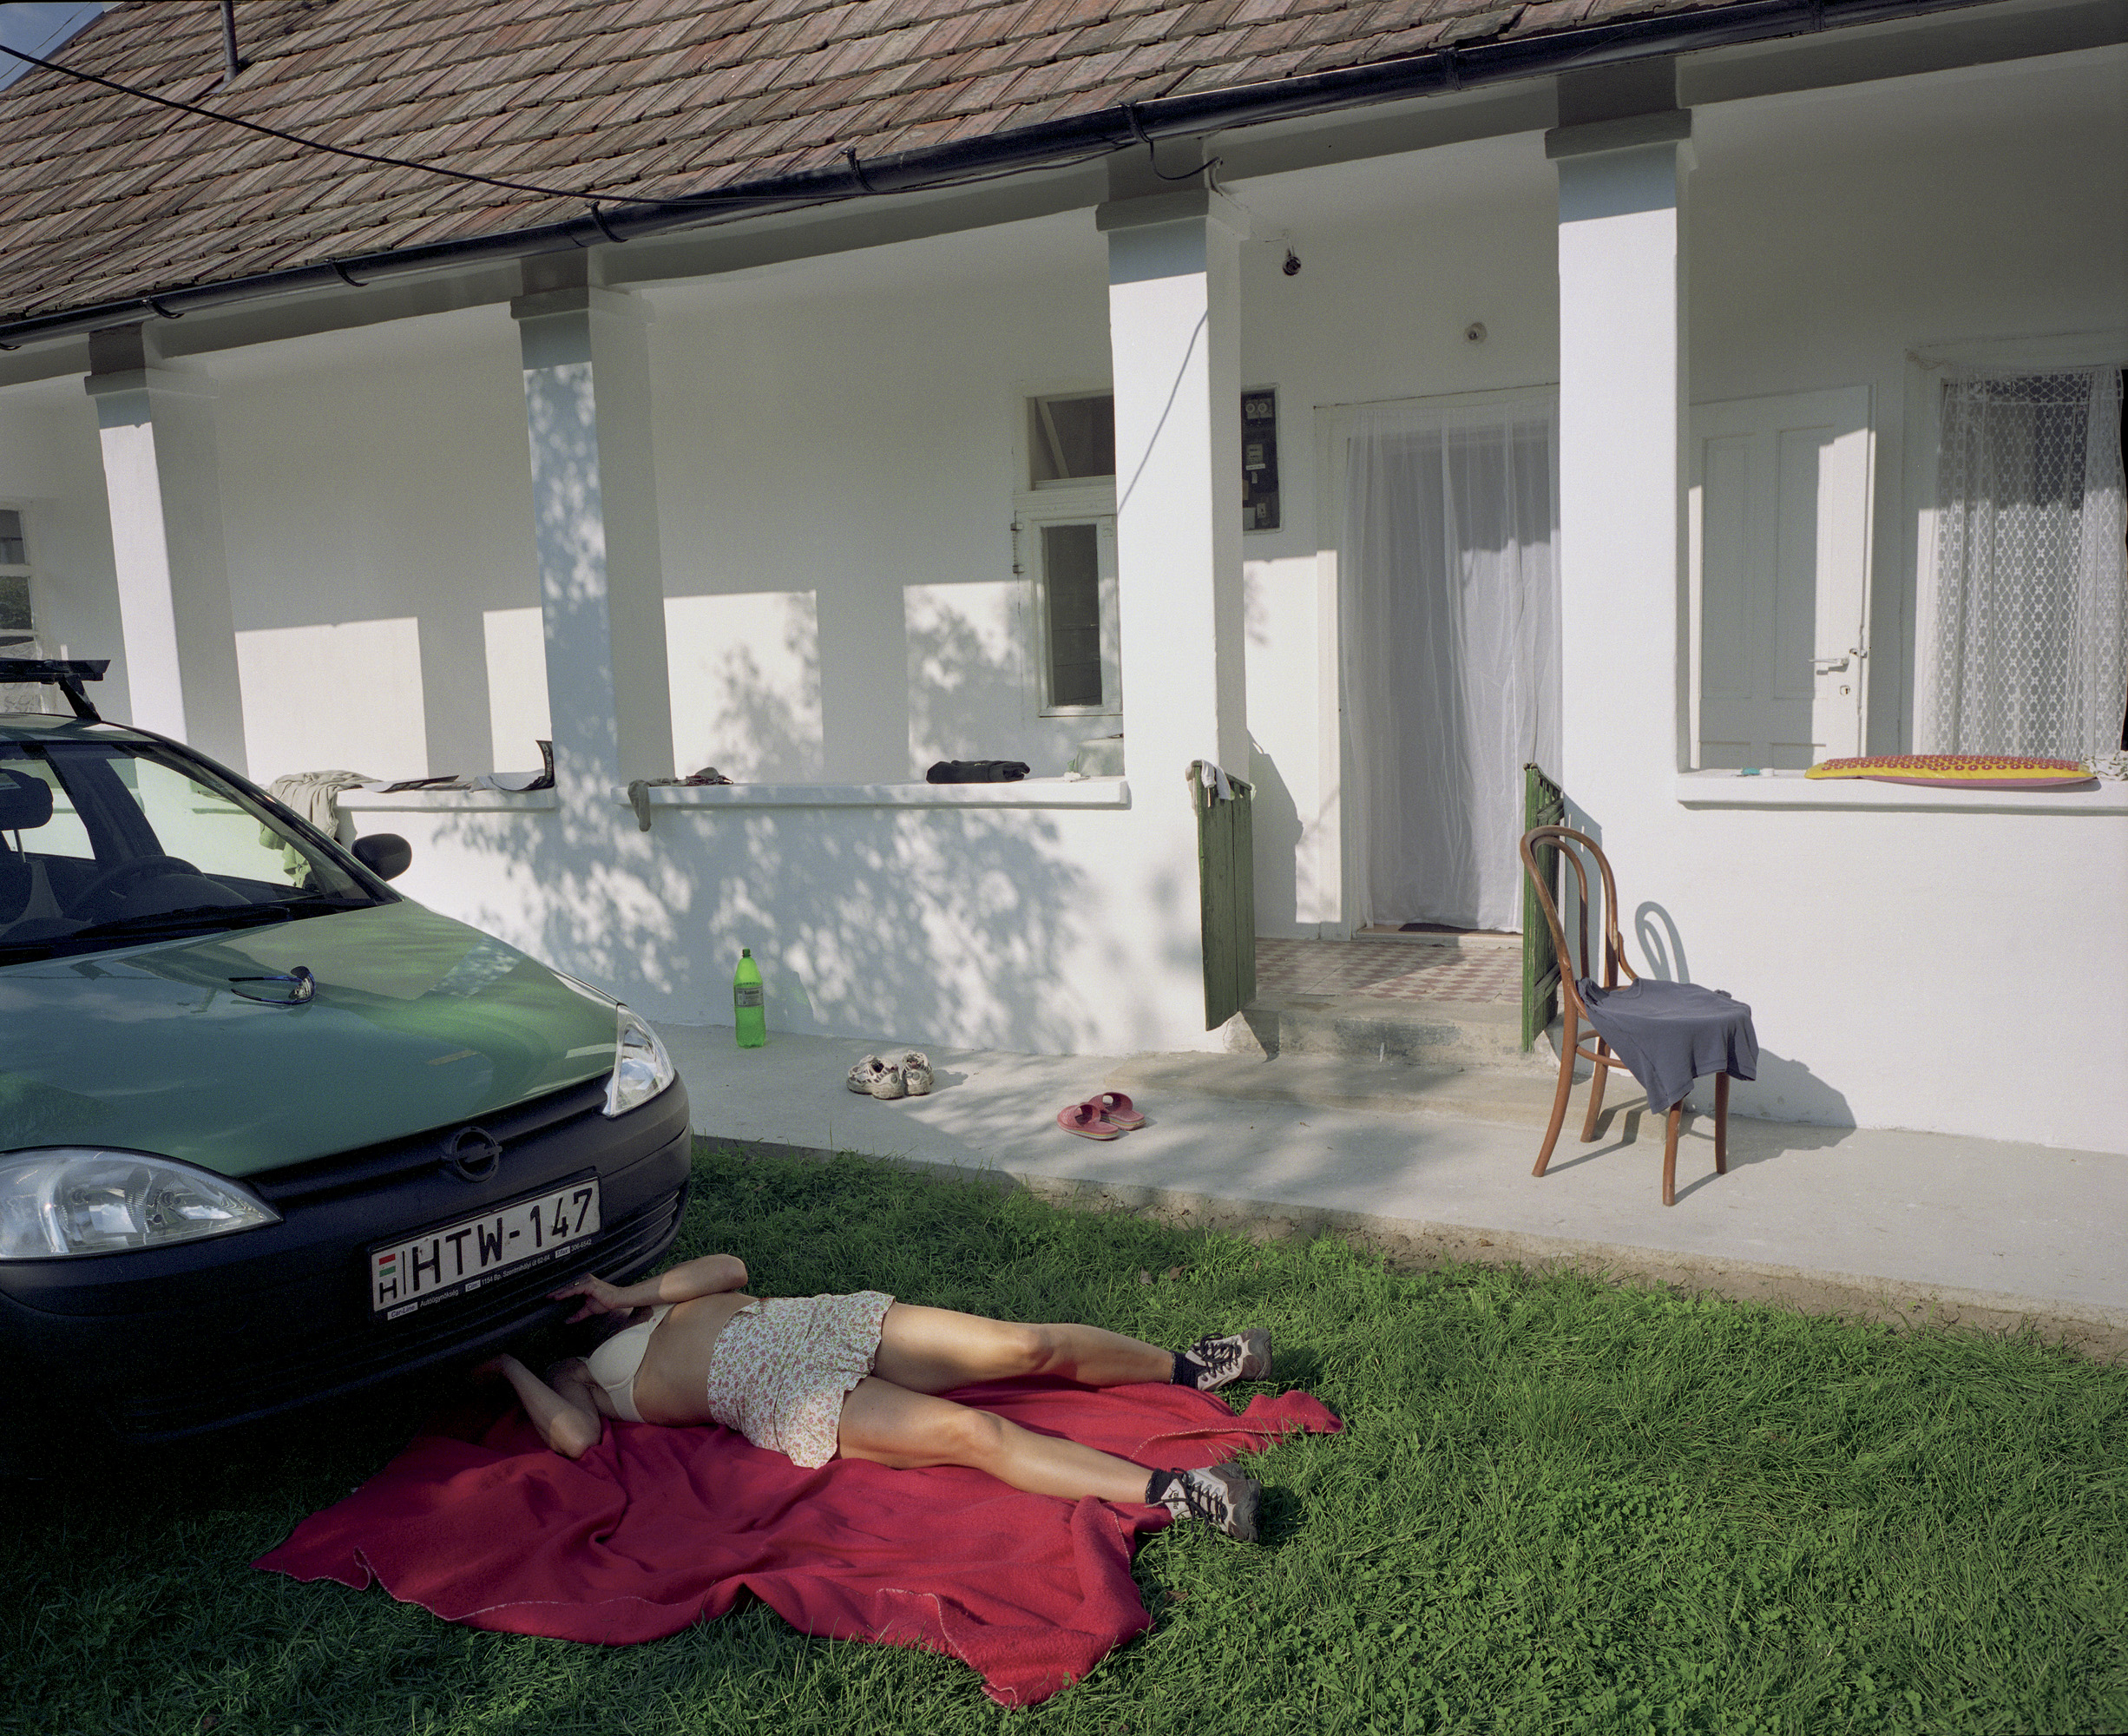 sundays-of-life-bela-doka-4.jpg